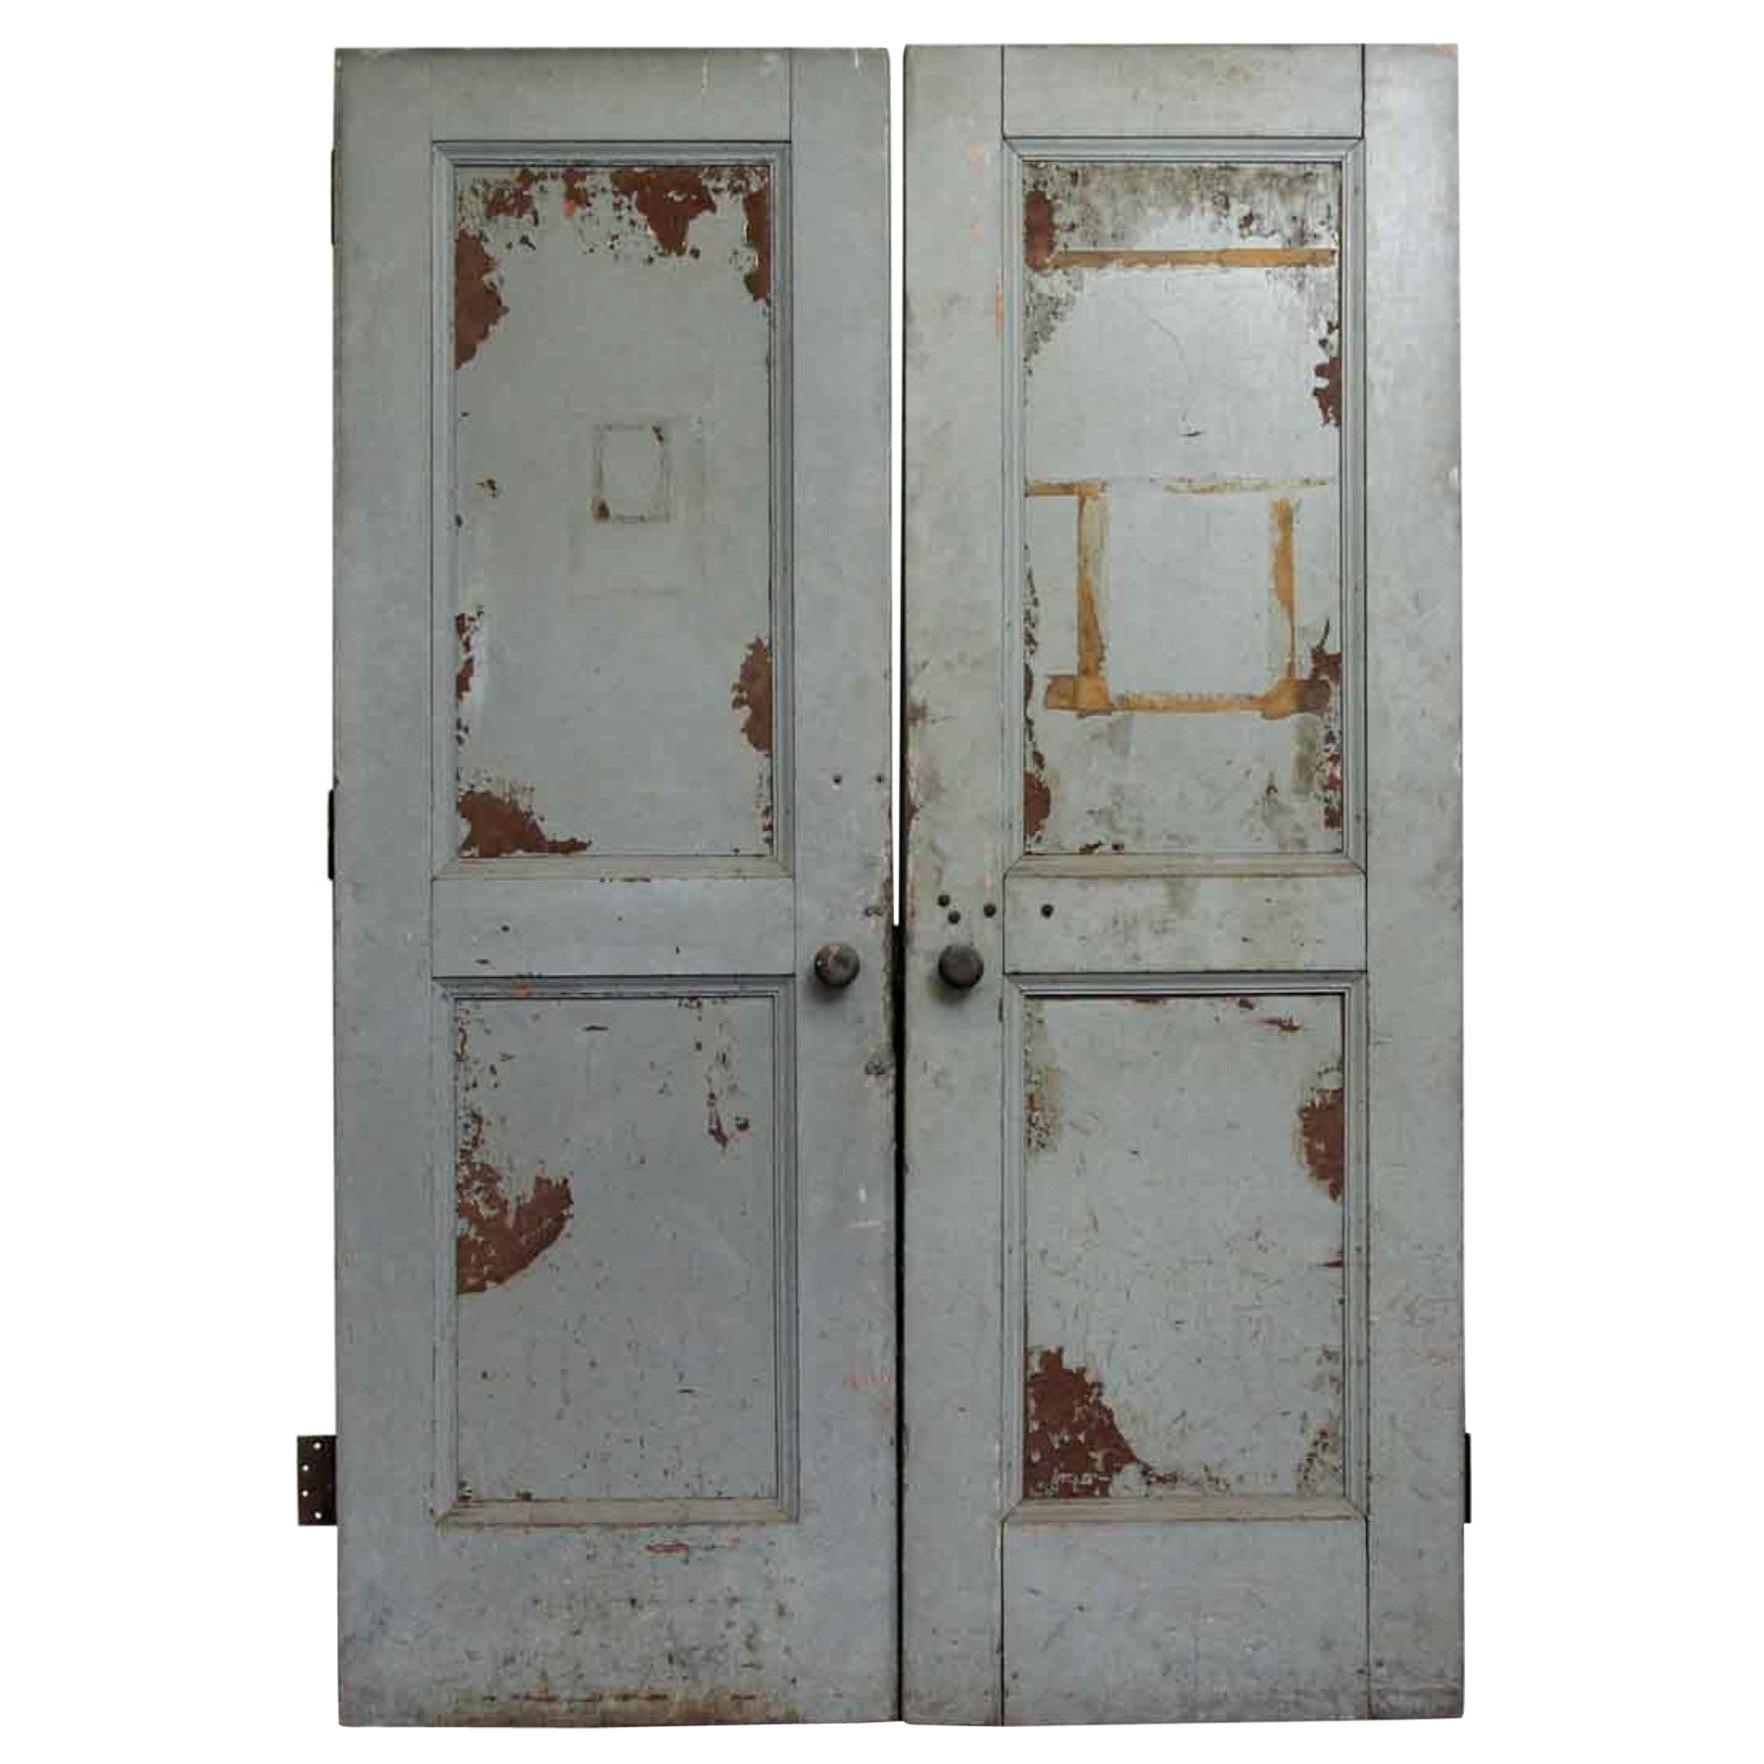 Early 1900s Two Panel Steel Clad Industrial Double Doors